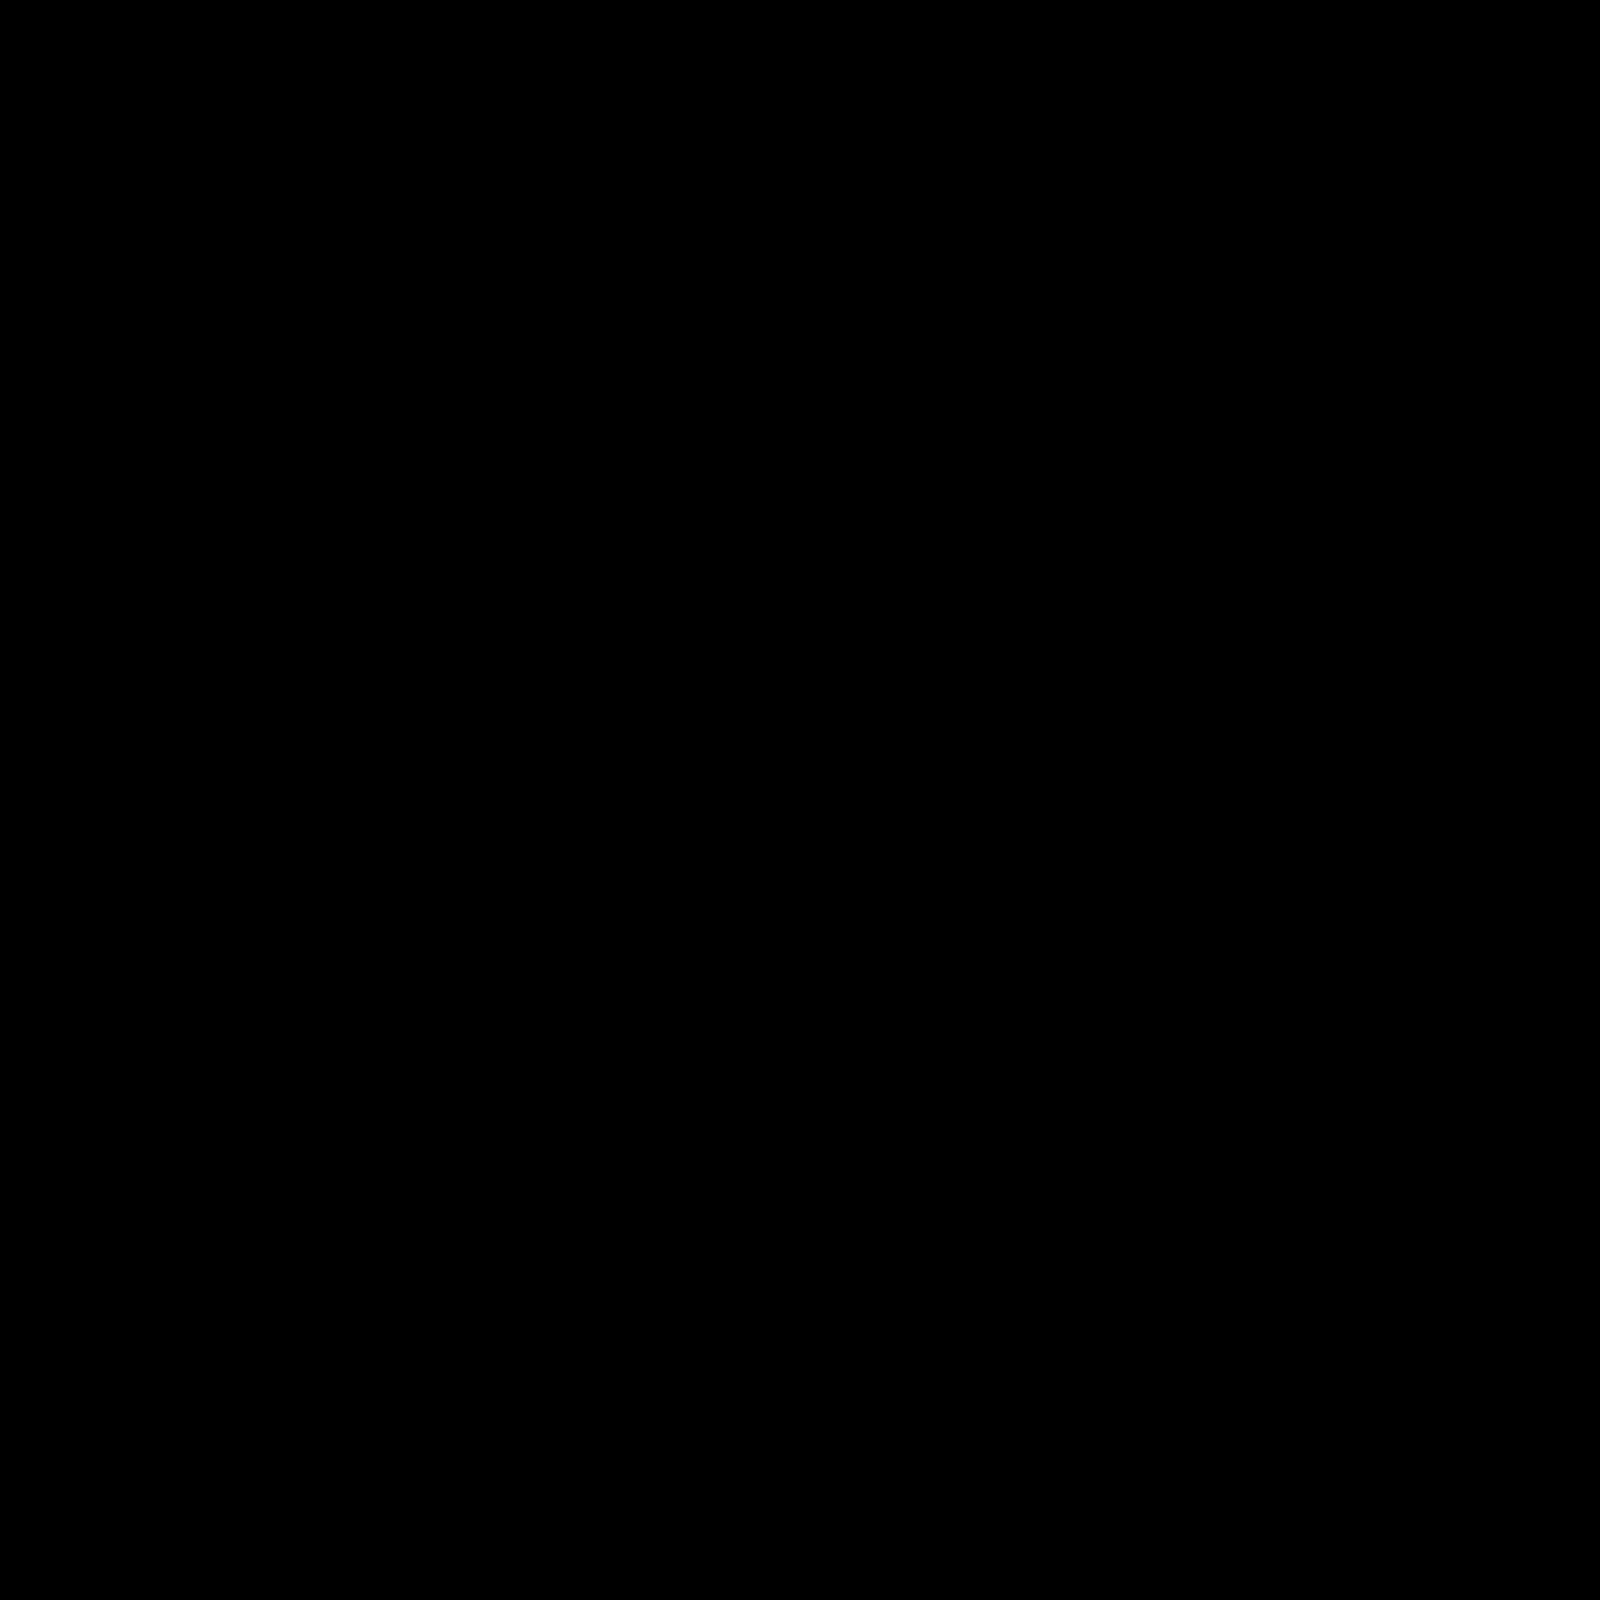 Swearing icon